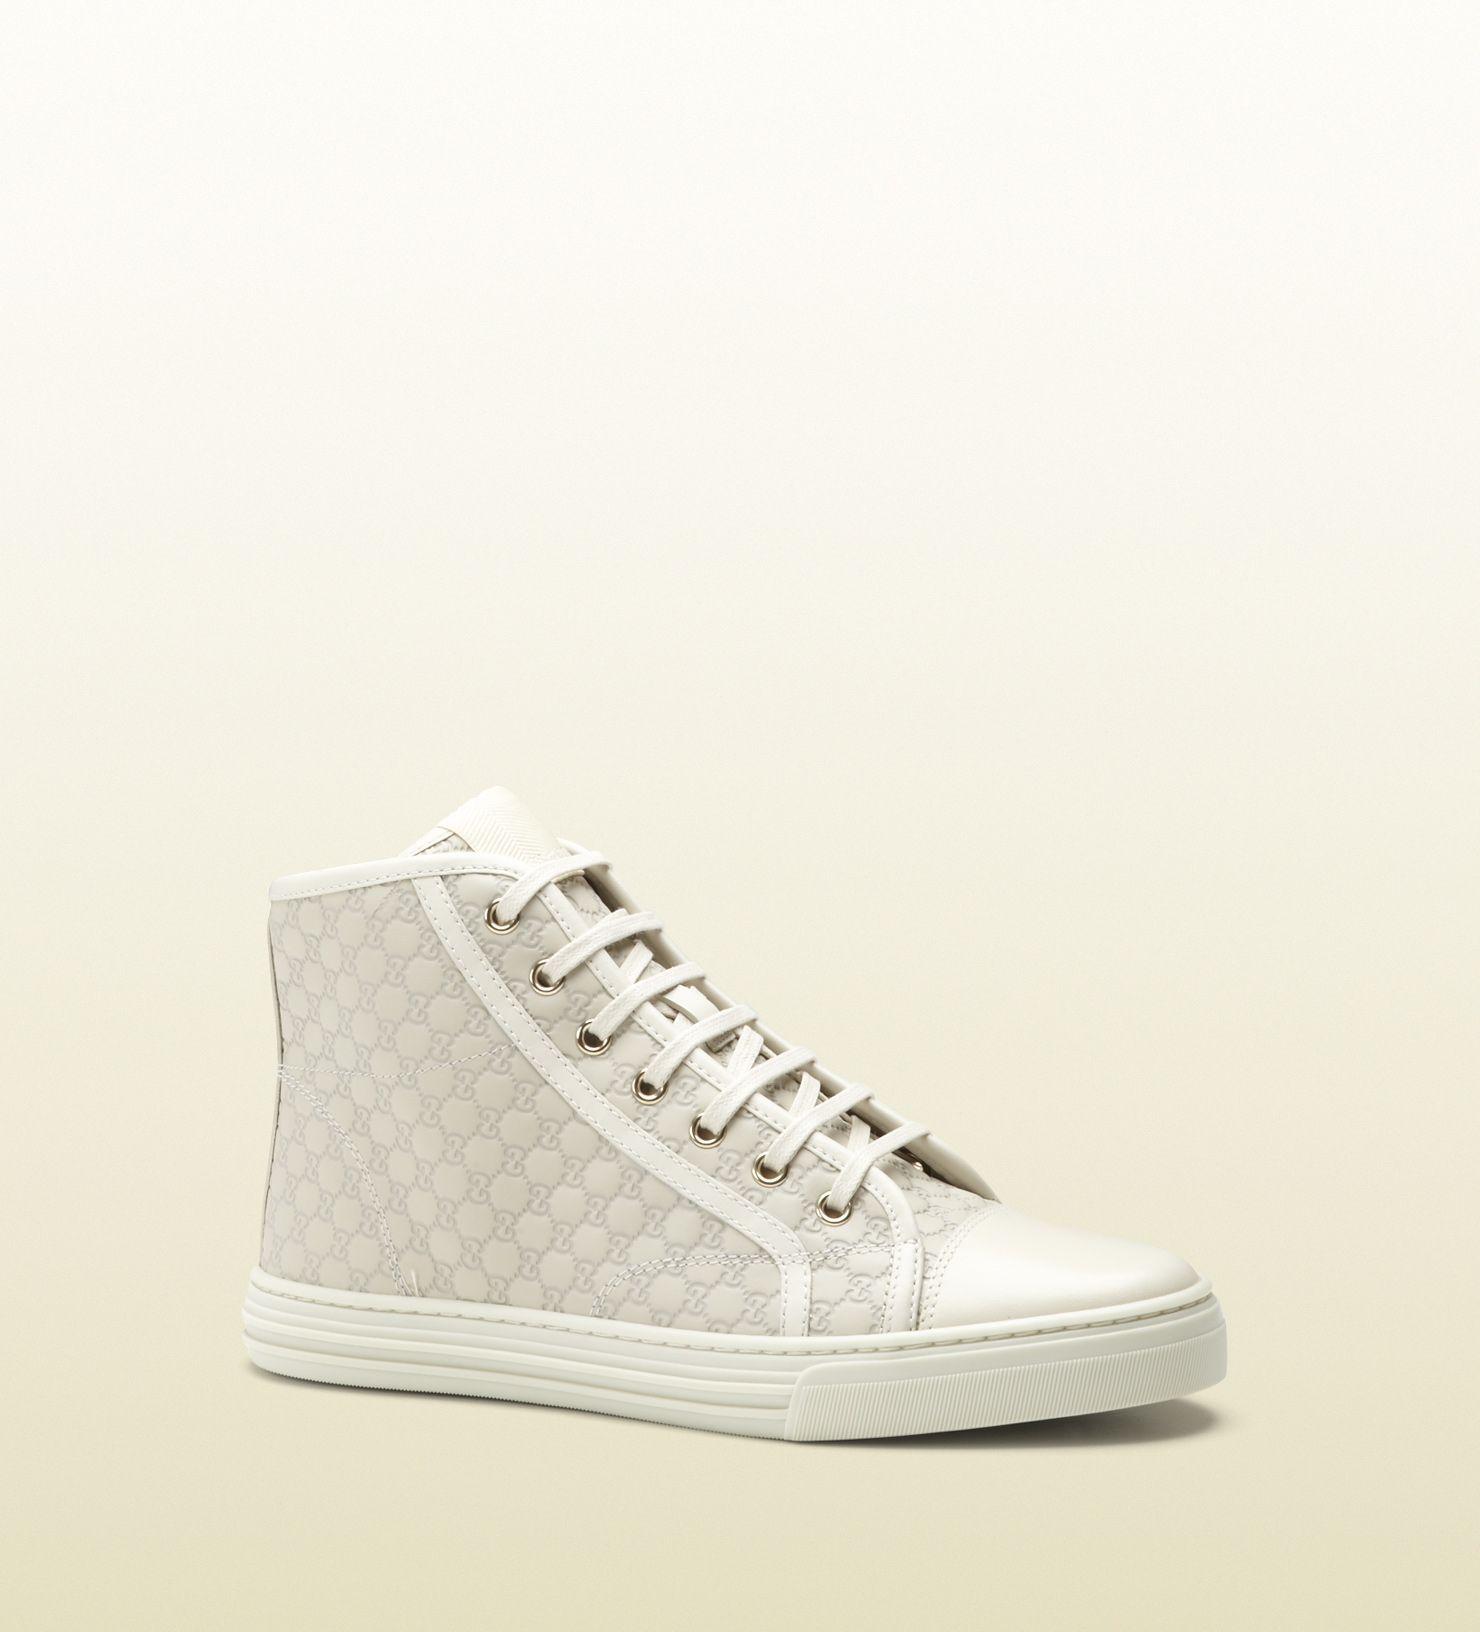 Gucci Hoher Sportlicher Schnurschuh California 435 Schuhe Frauen Schnurschuhe High Top Sneakers